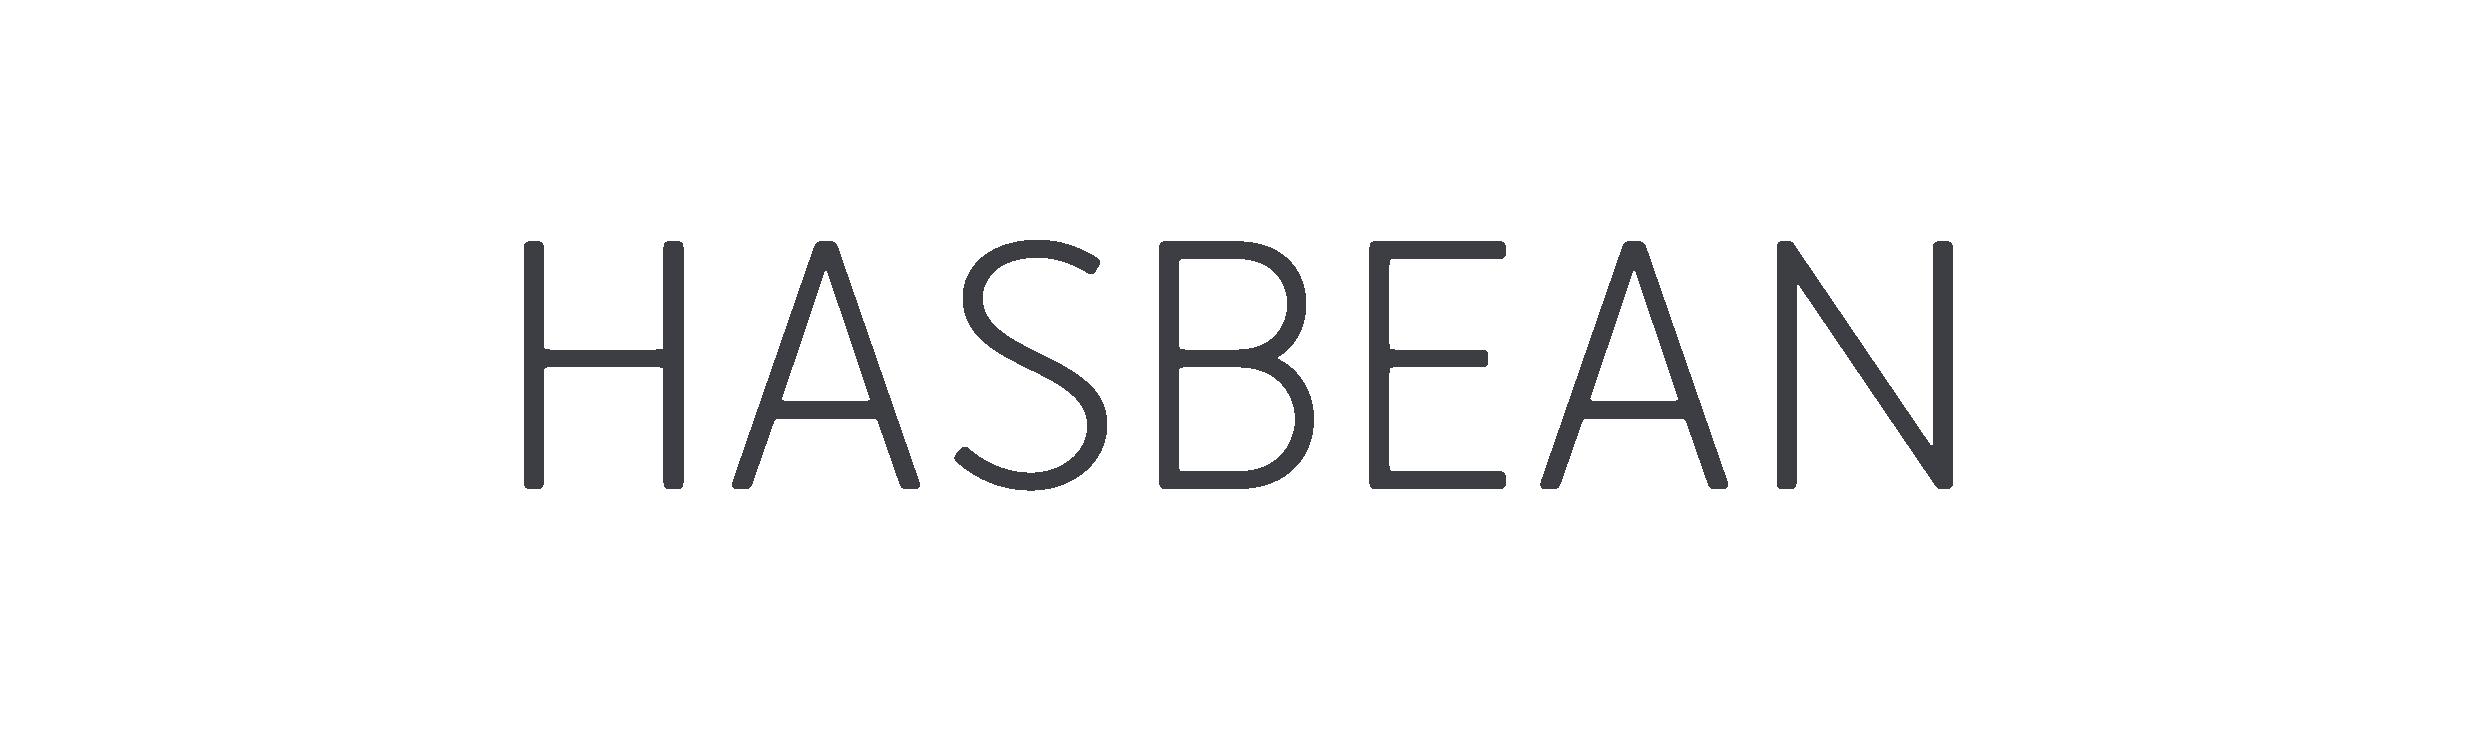 Hasbean